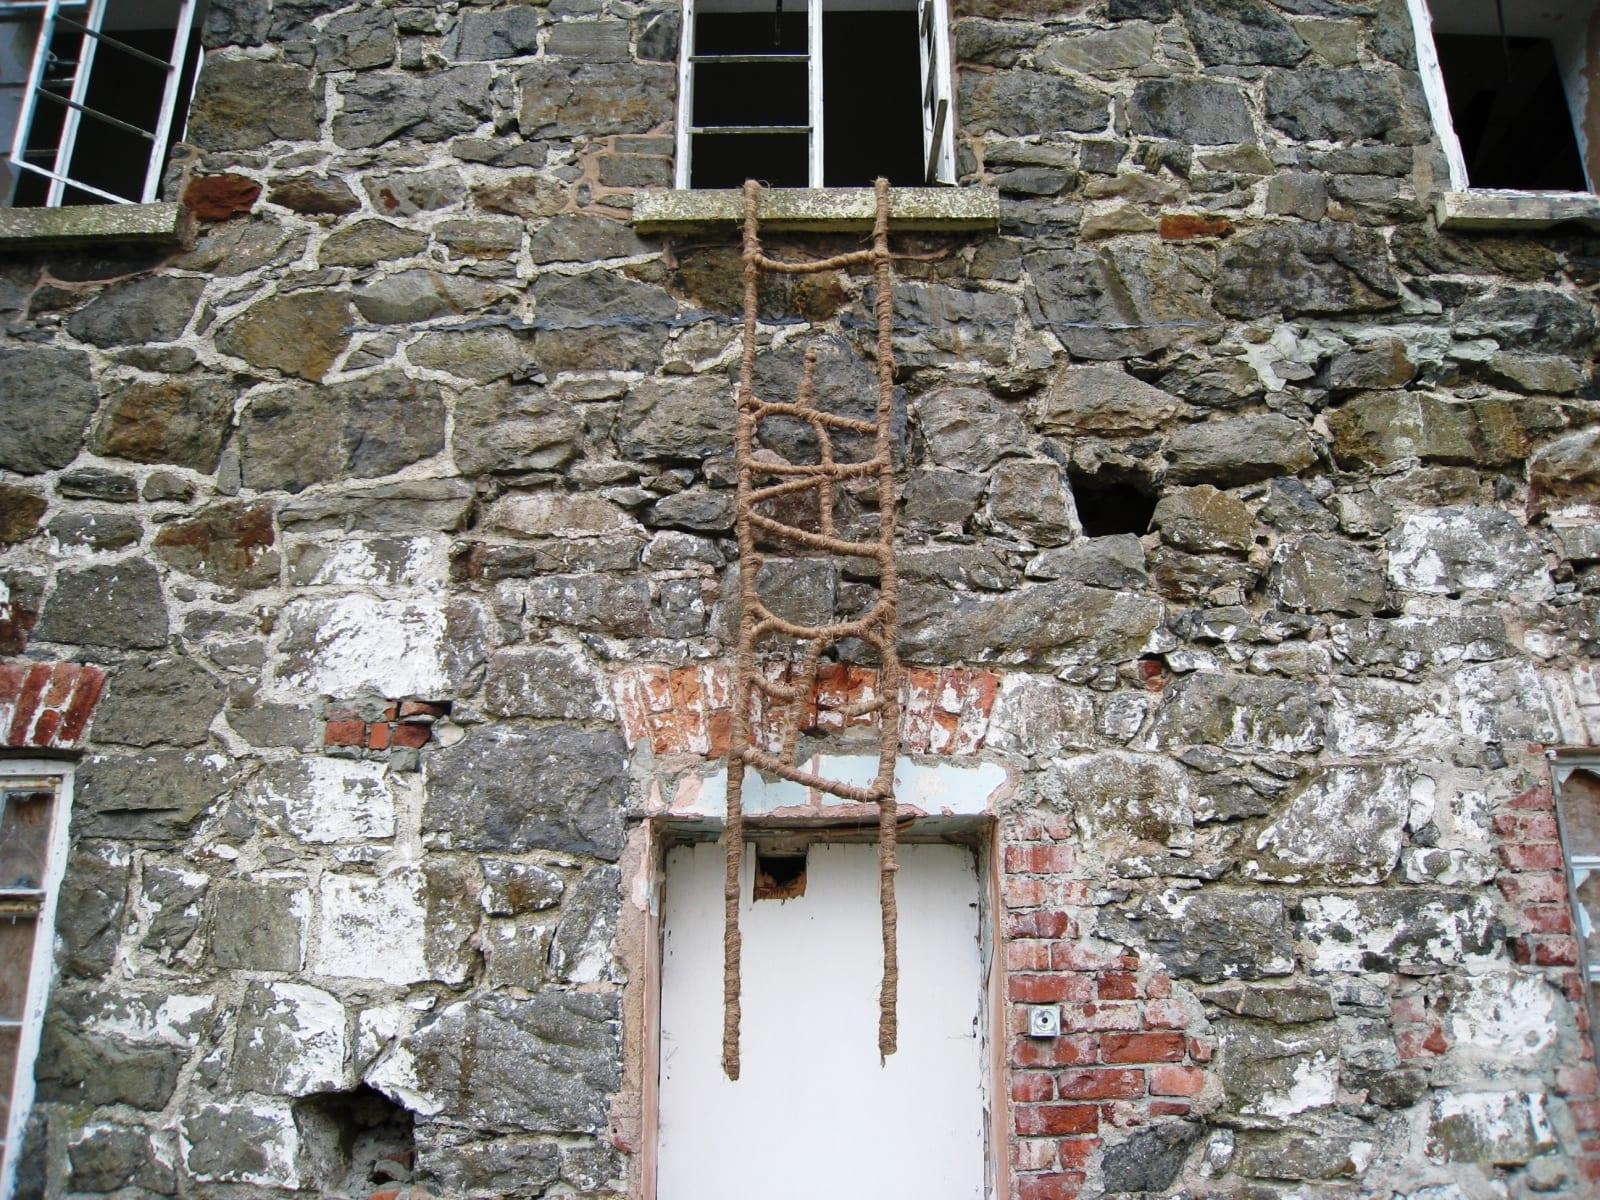 """POOR.WORK.HOUSE.ESCAPE.""  2008 4 nöörredelit - kohaspetsiifiline workshop ""Interventions"" Llanfyllin, Wales, Suurbritannia  ""POOR.WORK.HOUSE.ESCAPE.""  2008 4 ropeladders  - an international site-specific workshop ""Interventions"" in Llanfyllin, Wales, Great Britain"